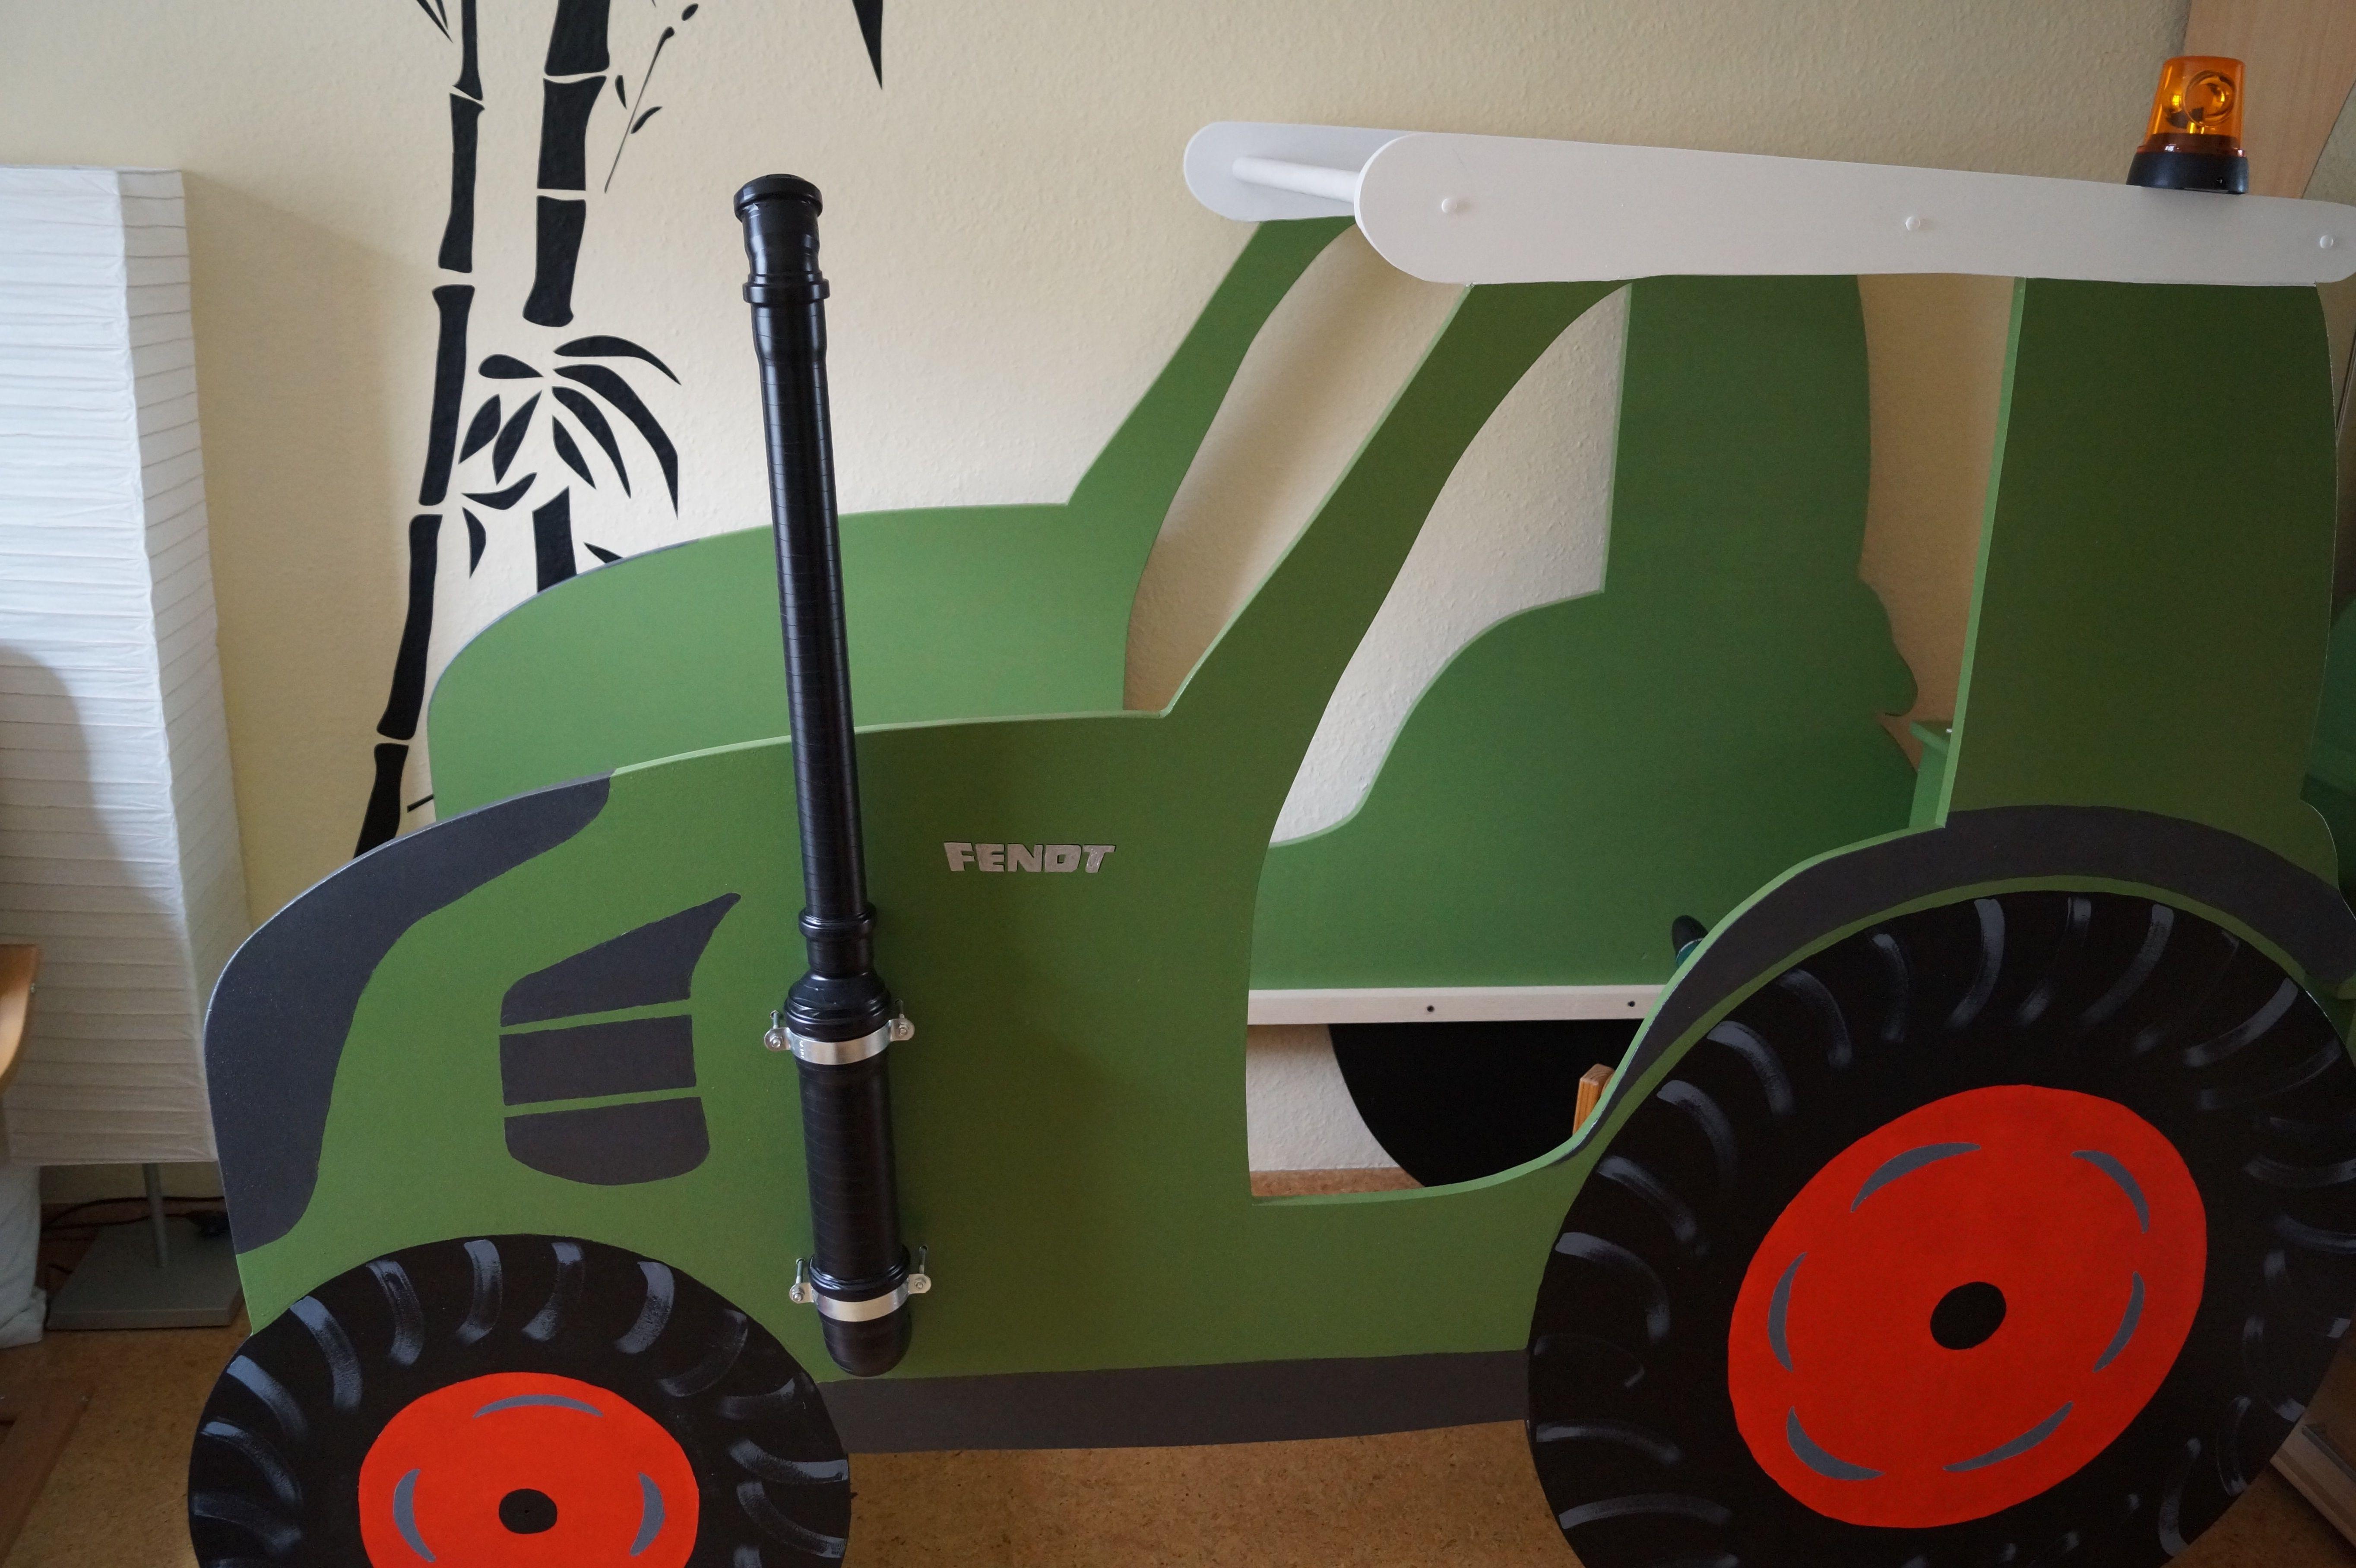 Etagenbett Autobett Bussy Kinderbett : Etagenbett bussy health technology valvira